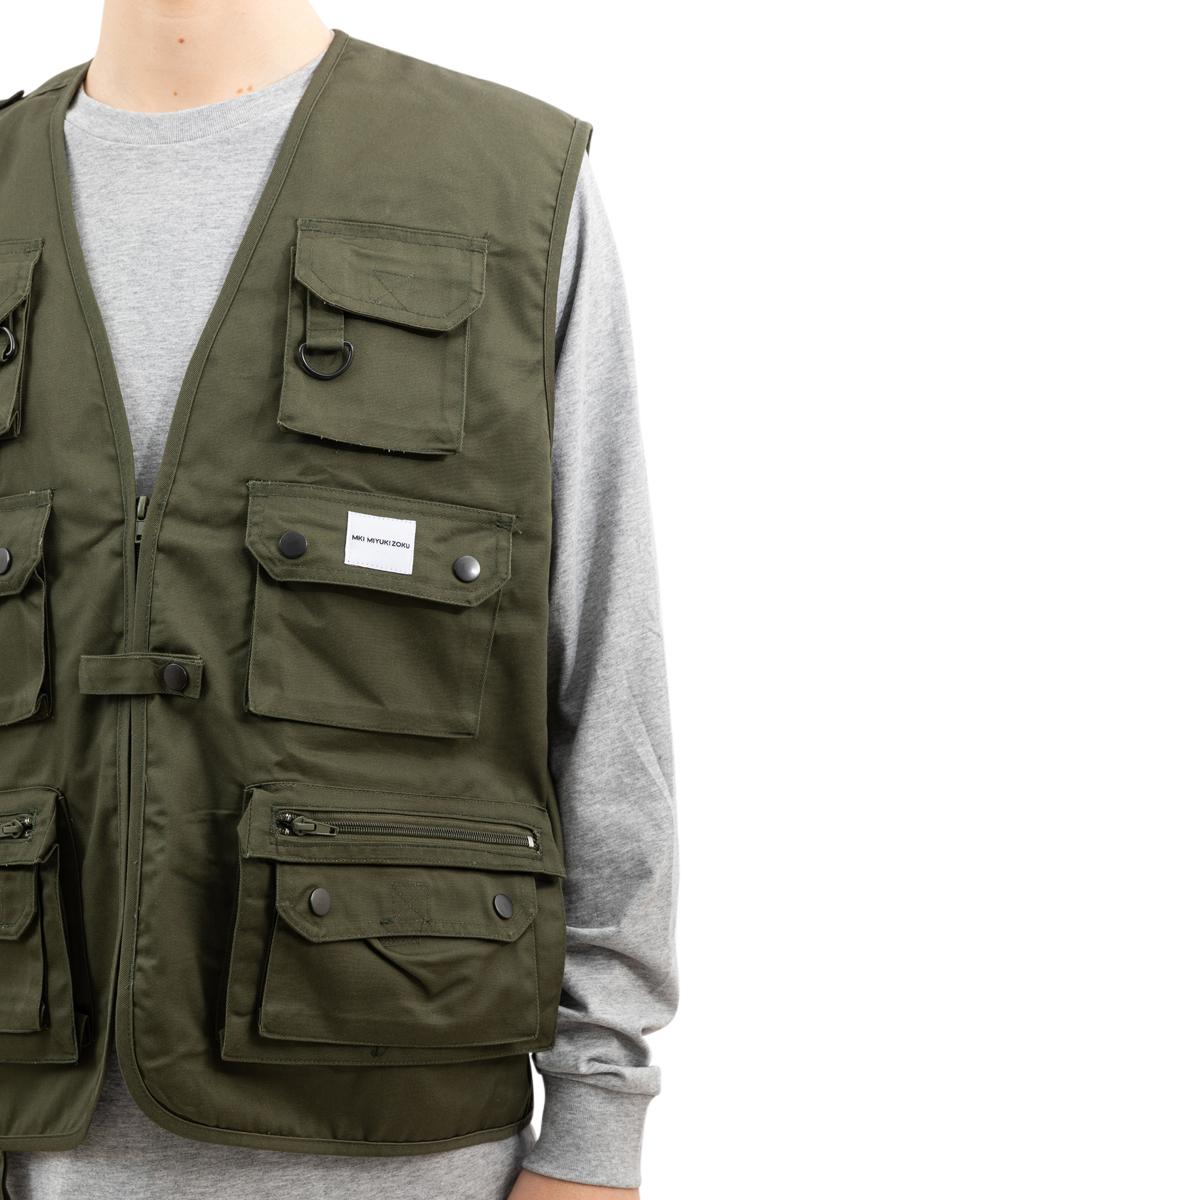 MKI Pocket Vest